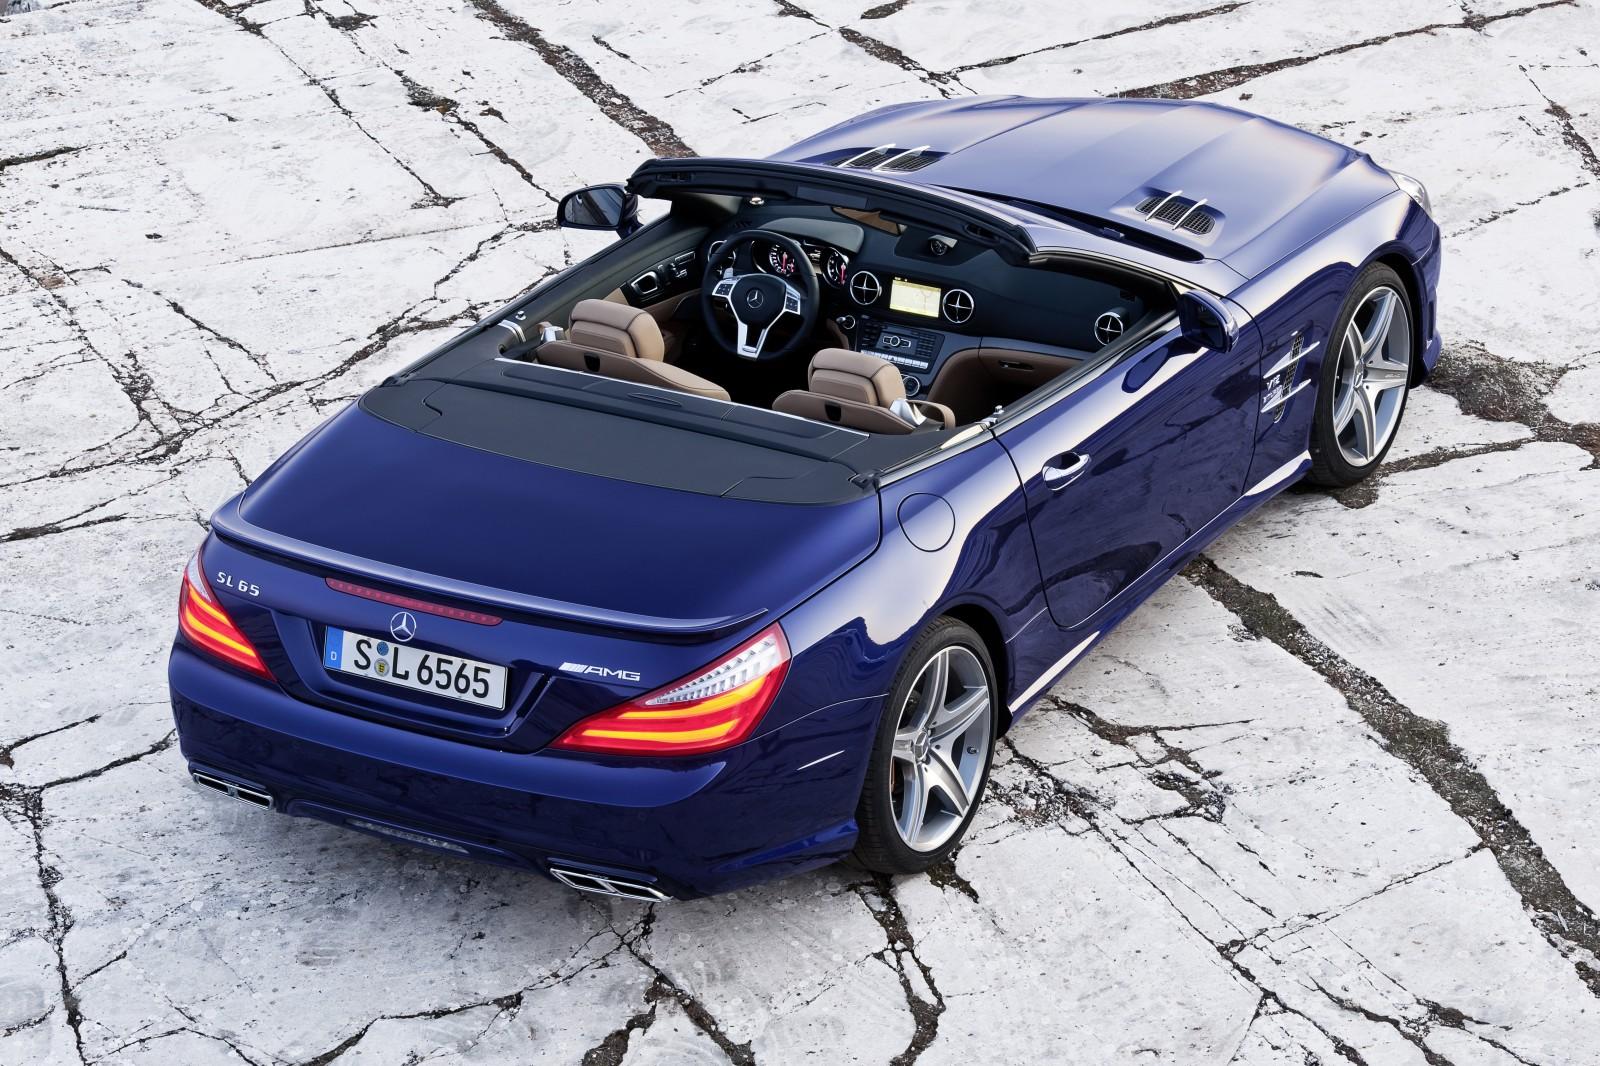 2013 mercedes benz sl class amg blue color cool cars for Mercedes benz sl 2013